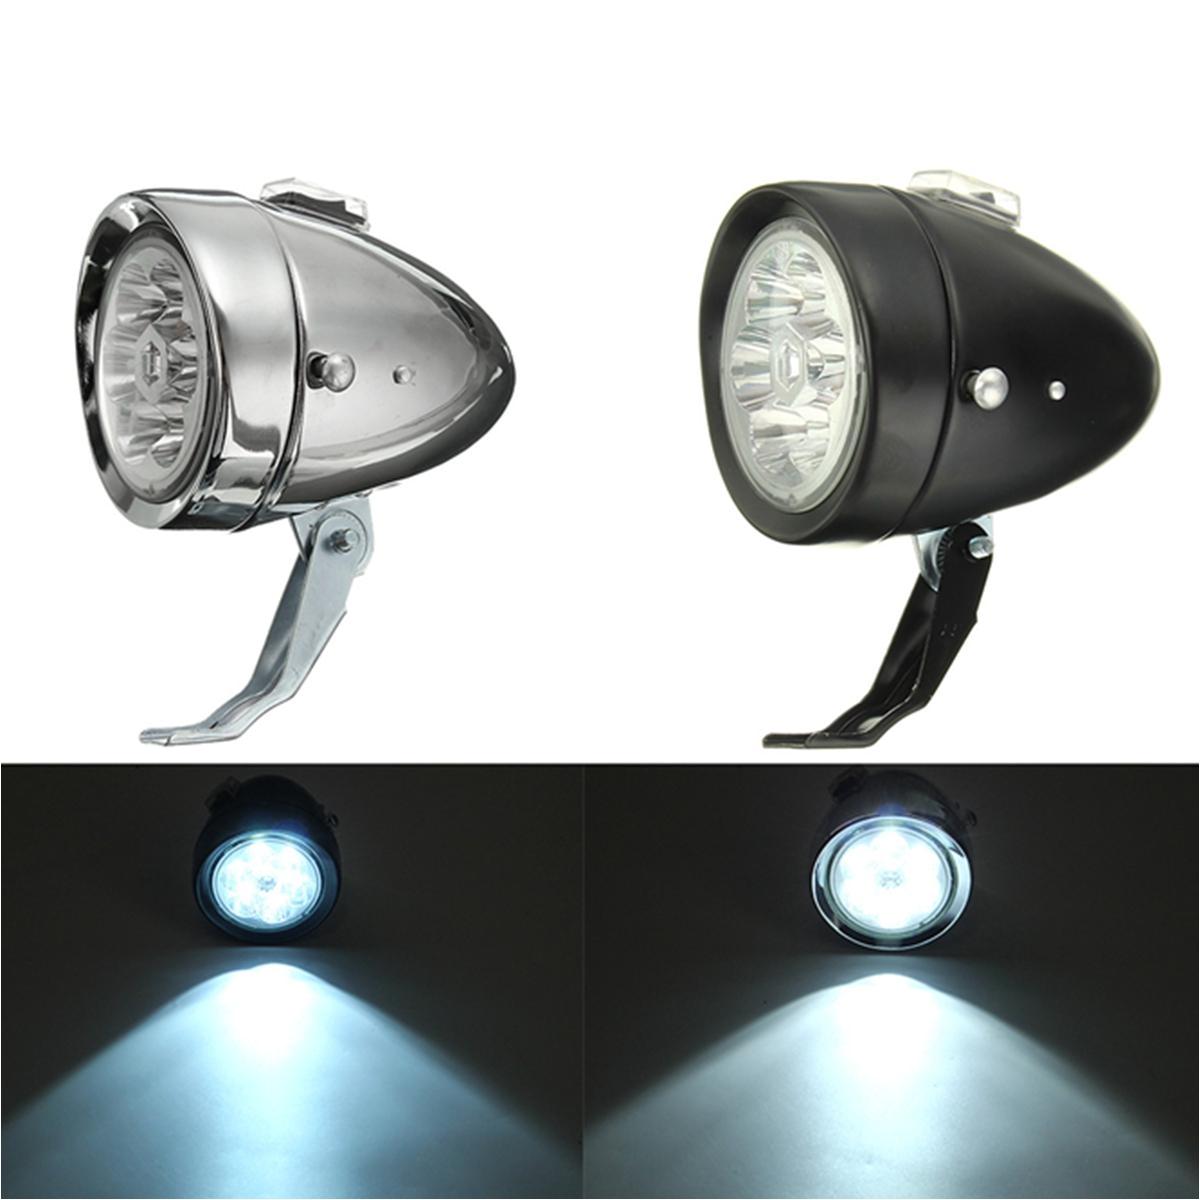 Wearable Led Lights Retro Vintage E Bike Bike Front Light Led Headlight Head Fog Lamp